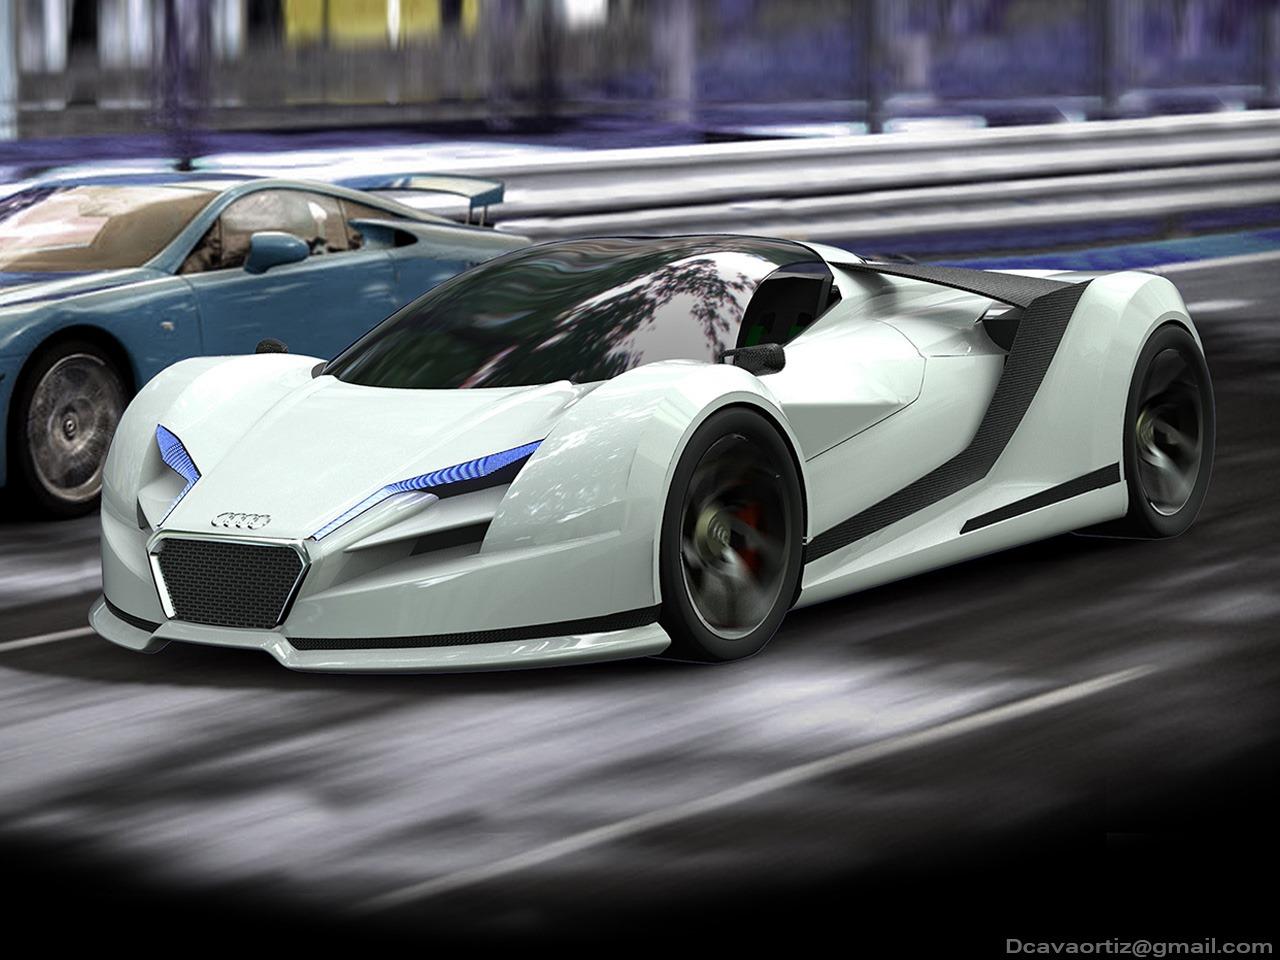 Render: Audi R10 Concept by David Cava - GTspirit